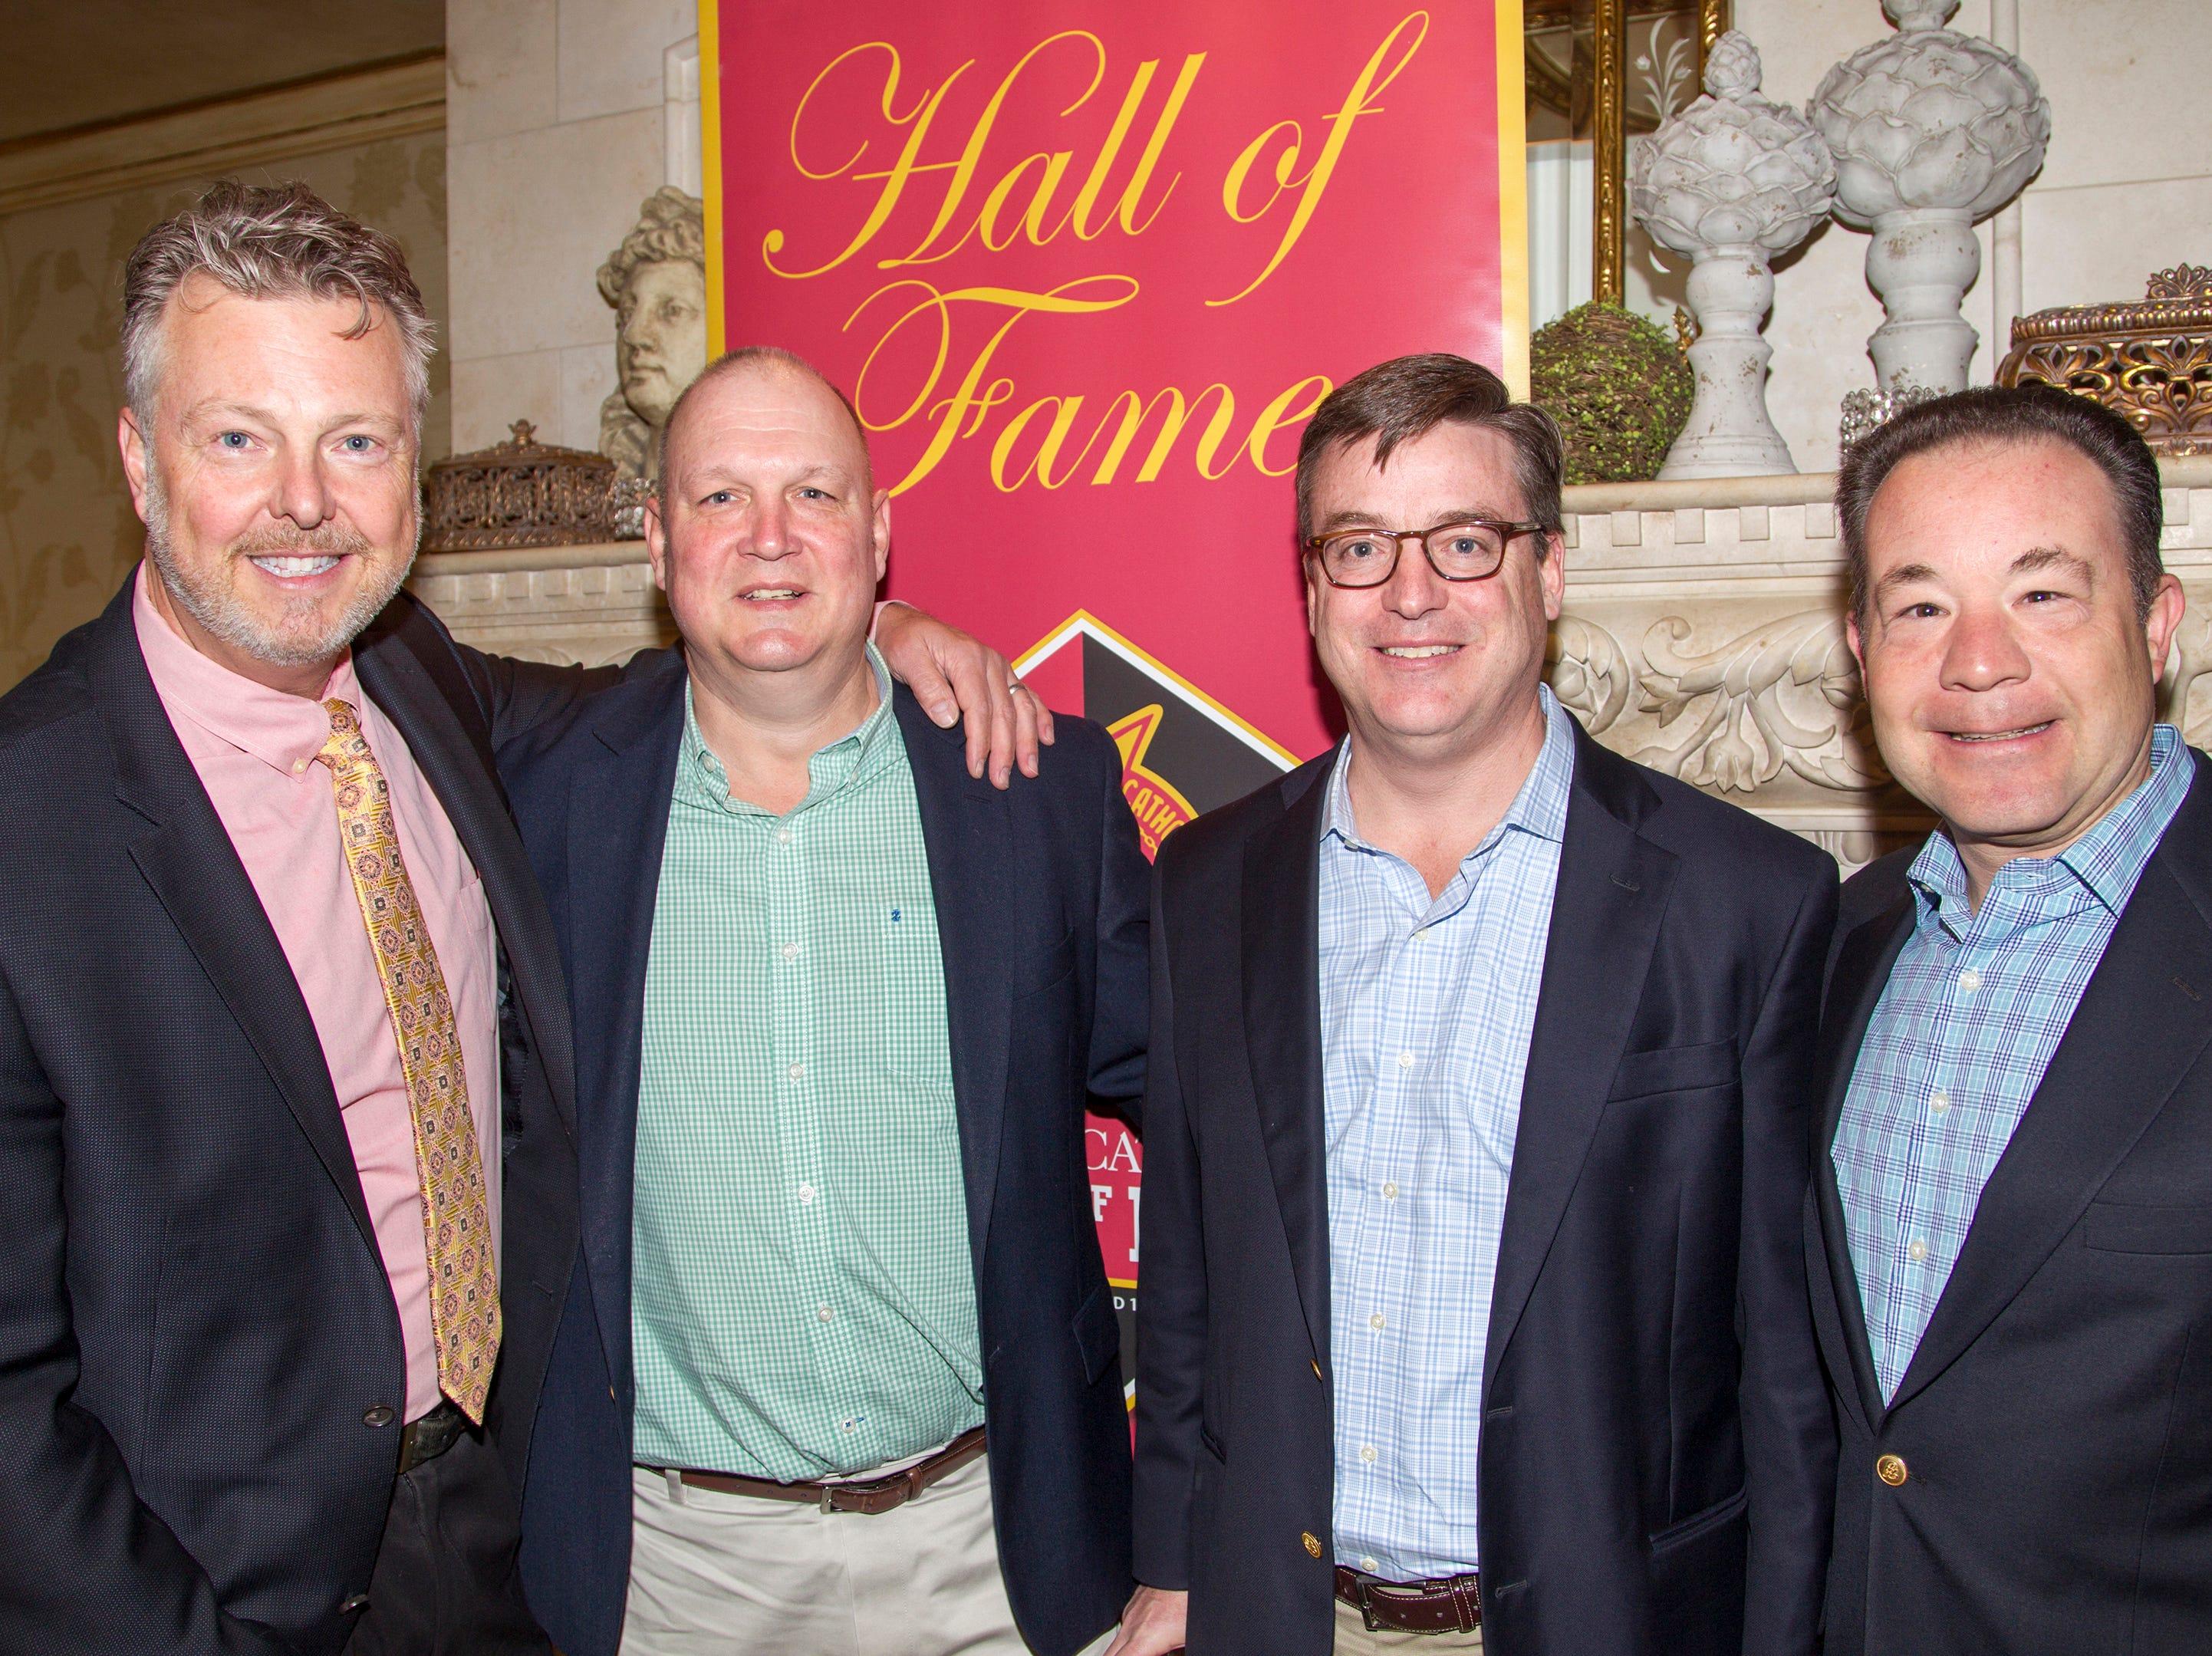 Brian Hughes, Pete Lambell, Matt Monahan, Paul Doherty. Bergen Catholic High School Hall of Fame Dinner at Seasons in Washington Twp. 03/31/2019